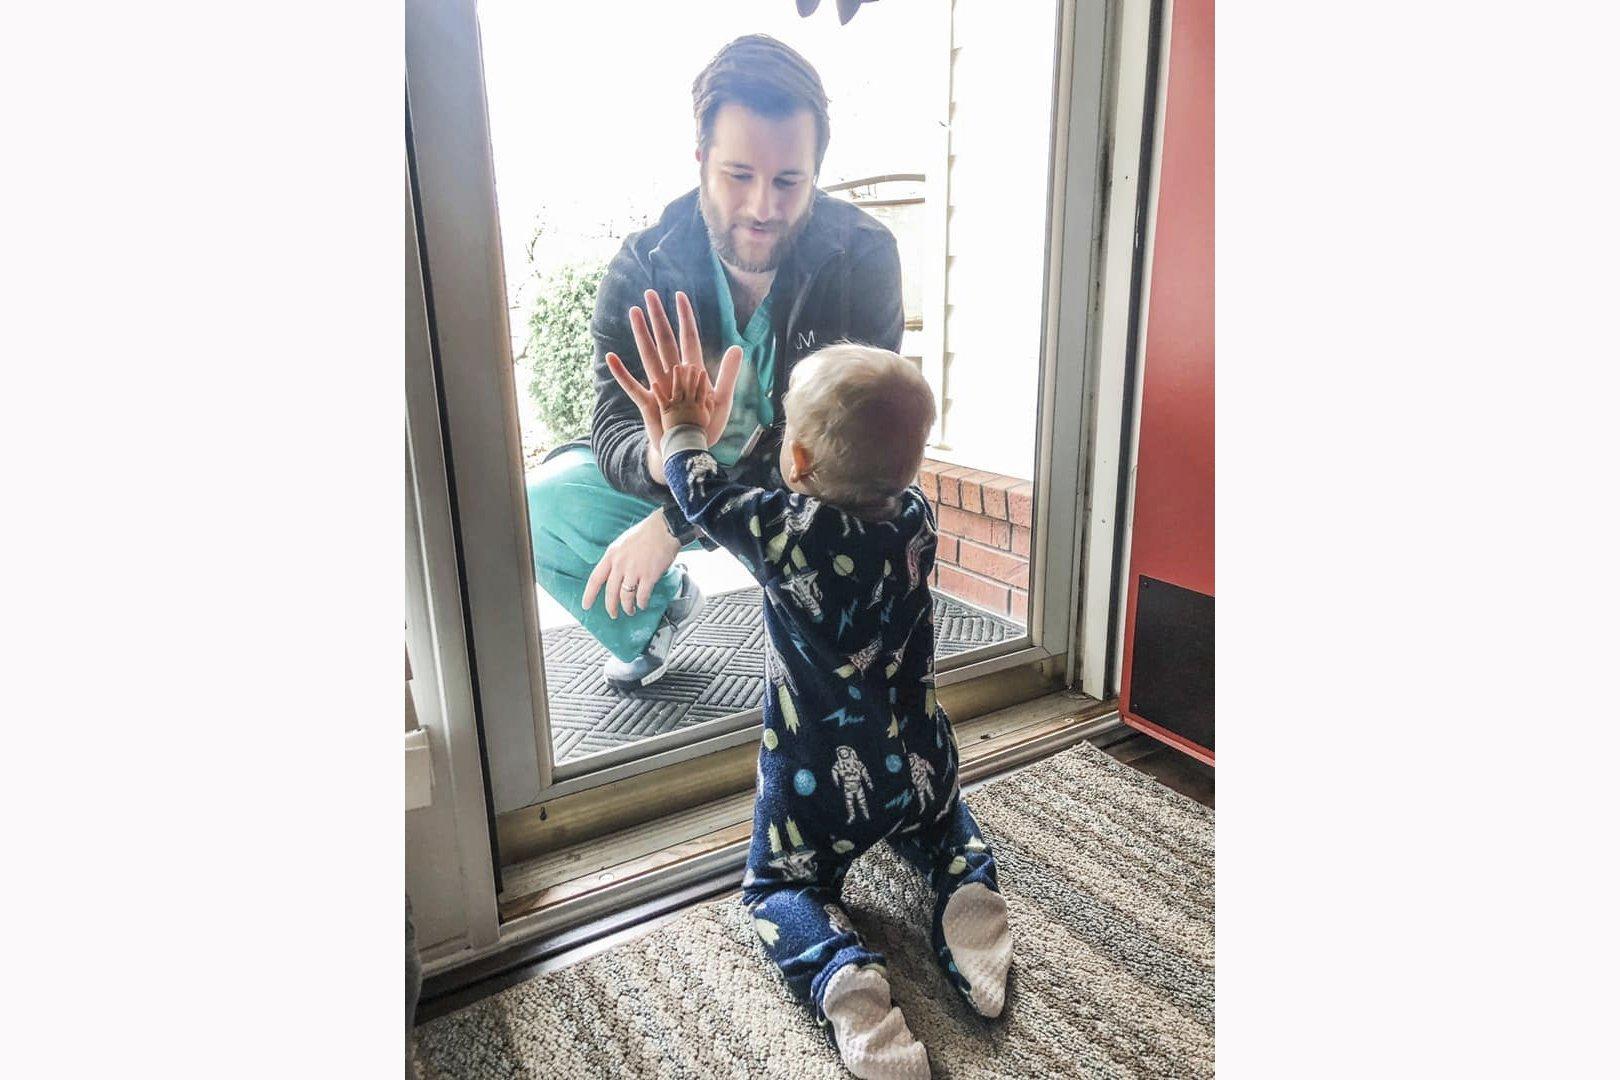 Father-son photo taken days before tornado destroys home